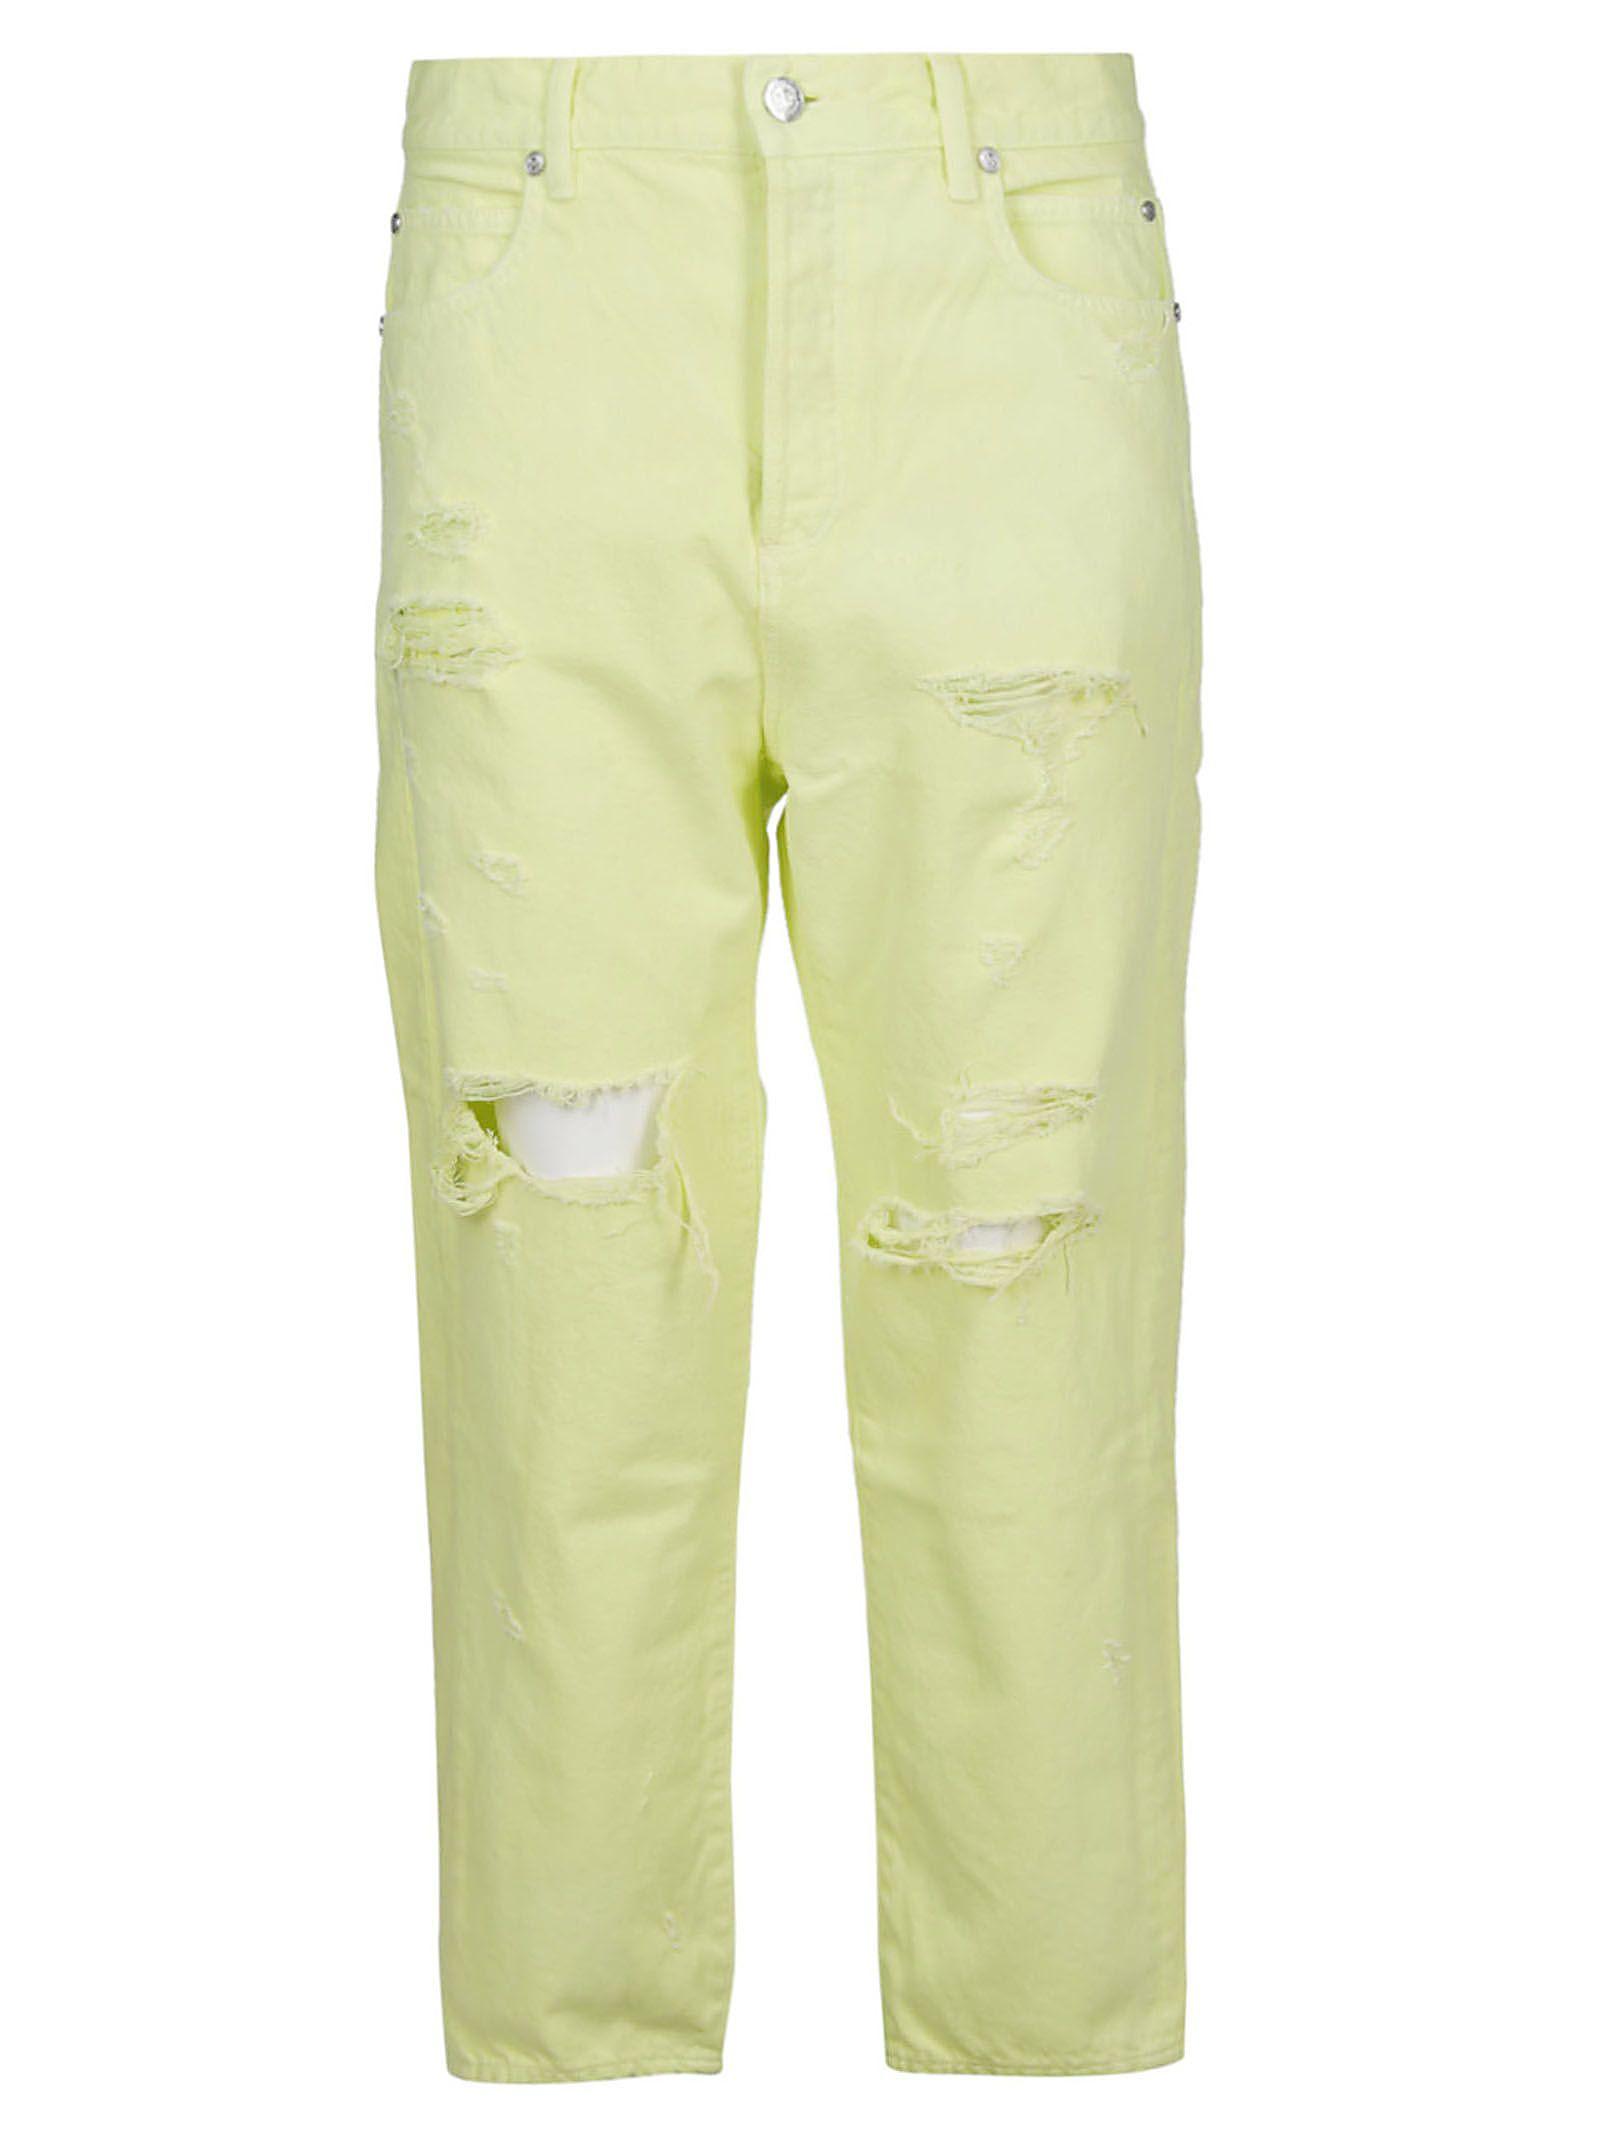 666ea715 Balmain Balmain Distressed Jeans - YELLOW FLUO - 10813748 | italist